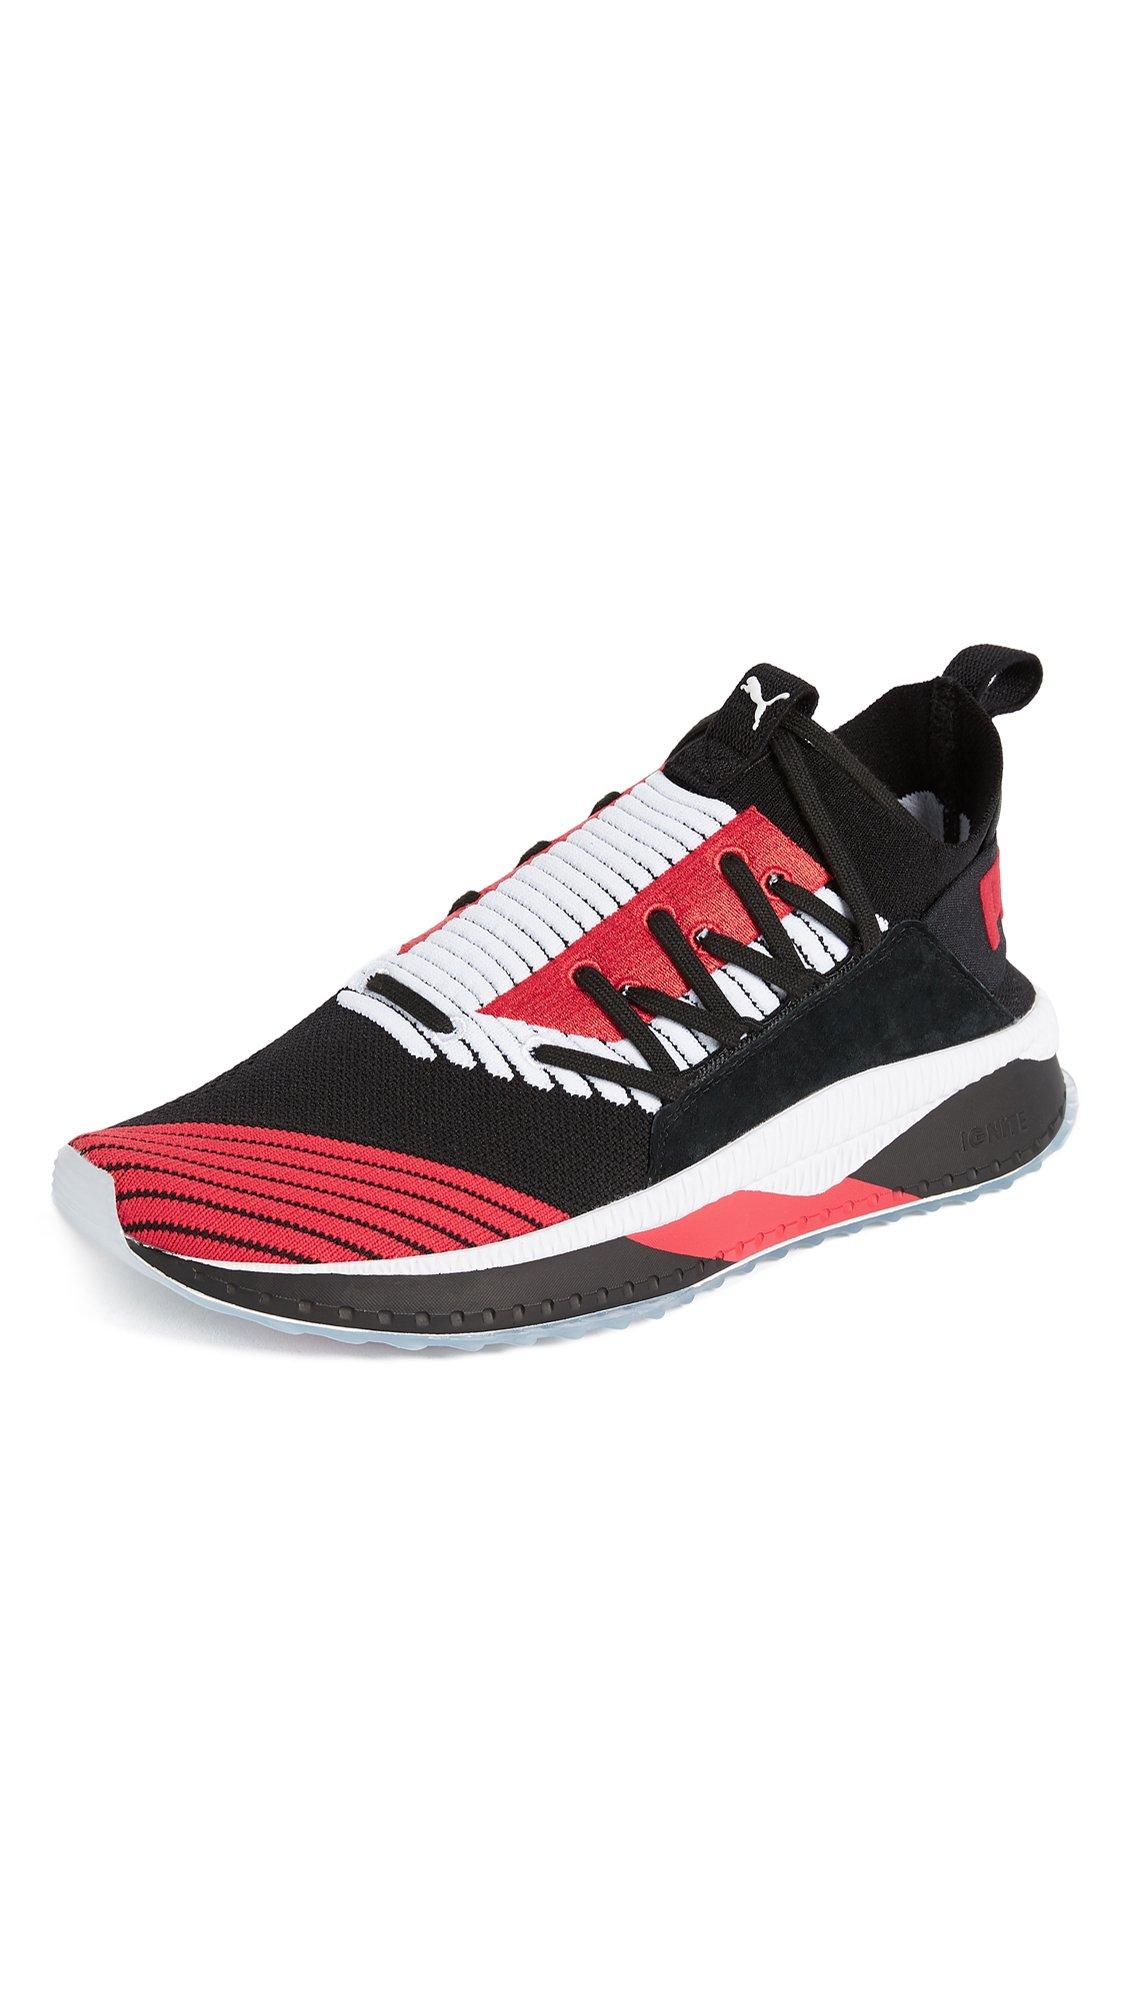 PUMA Select Men's Tsugi JUN Cubism Sneakers, Black/White/Flame, 9.5 D(M) US